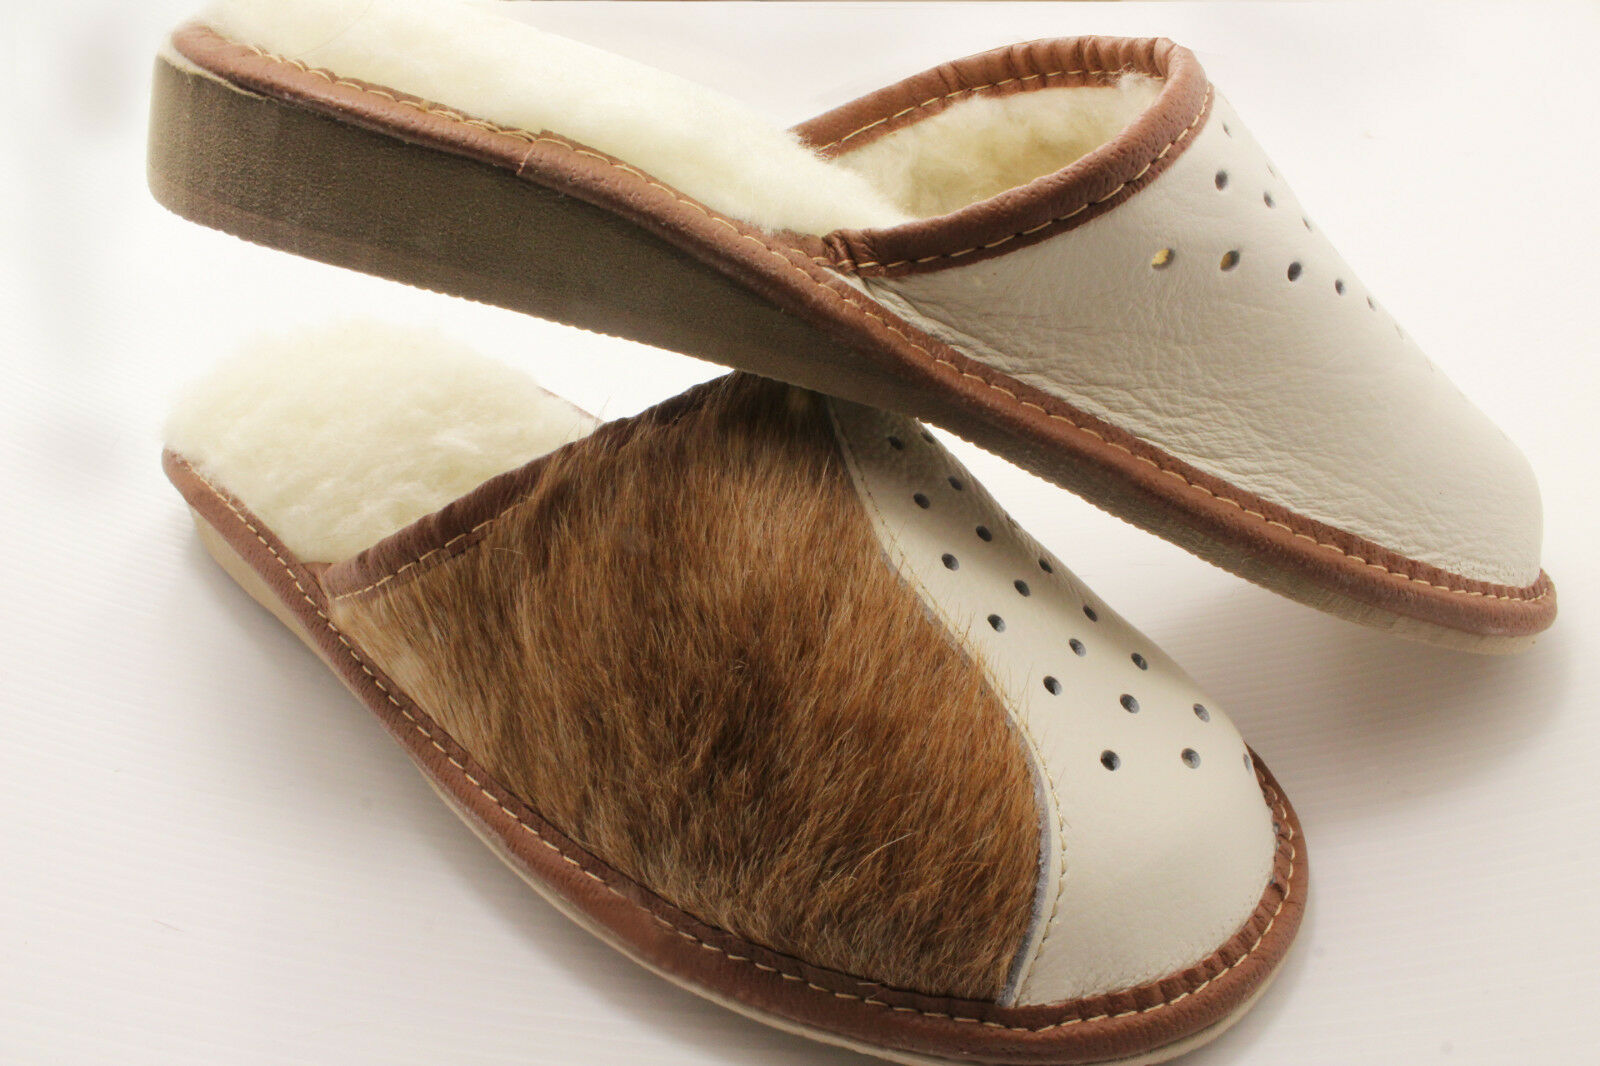 SLIPPERS Scuffs Size Genuine Leather Warm WOOL Size Scuffs (women's ):5,6, 7,8,8.5,9.5, e703d7